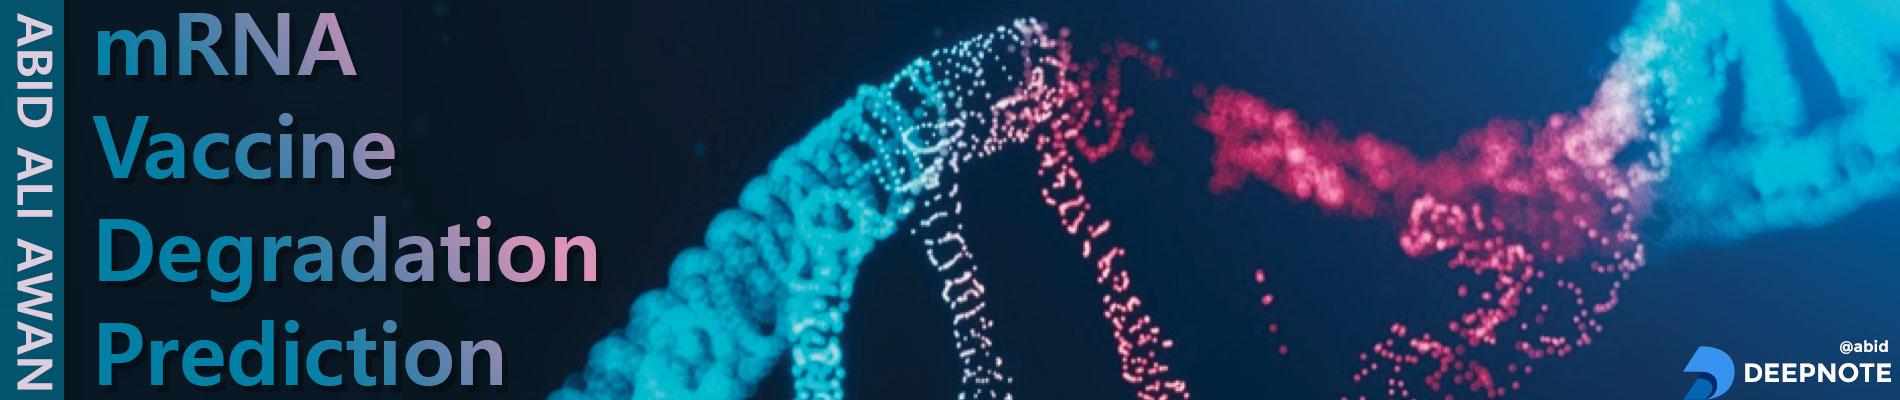 mRNA Vaccine Degradation Prediction –image